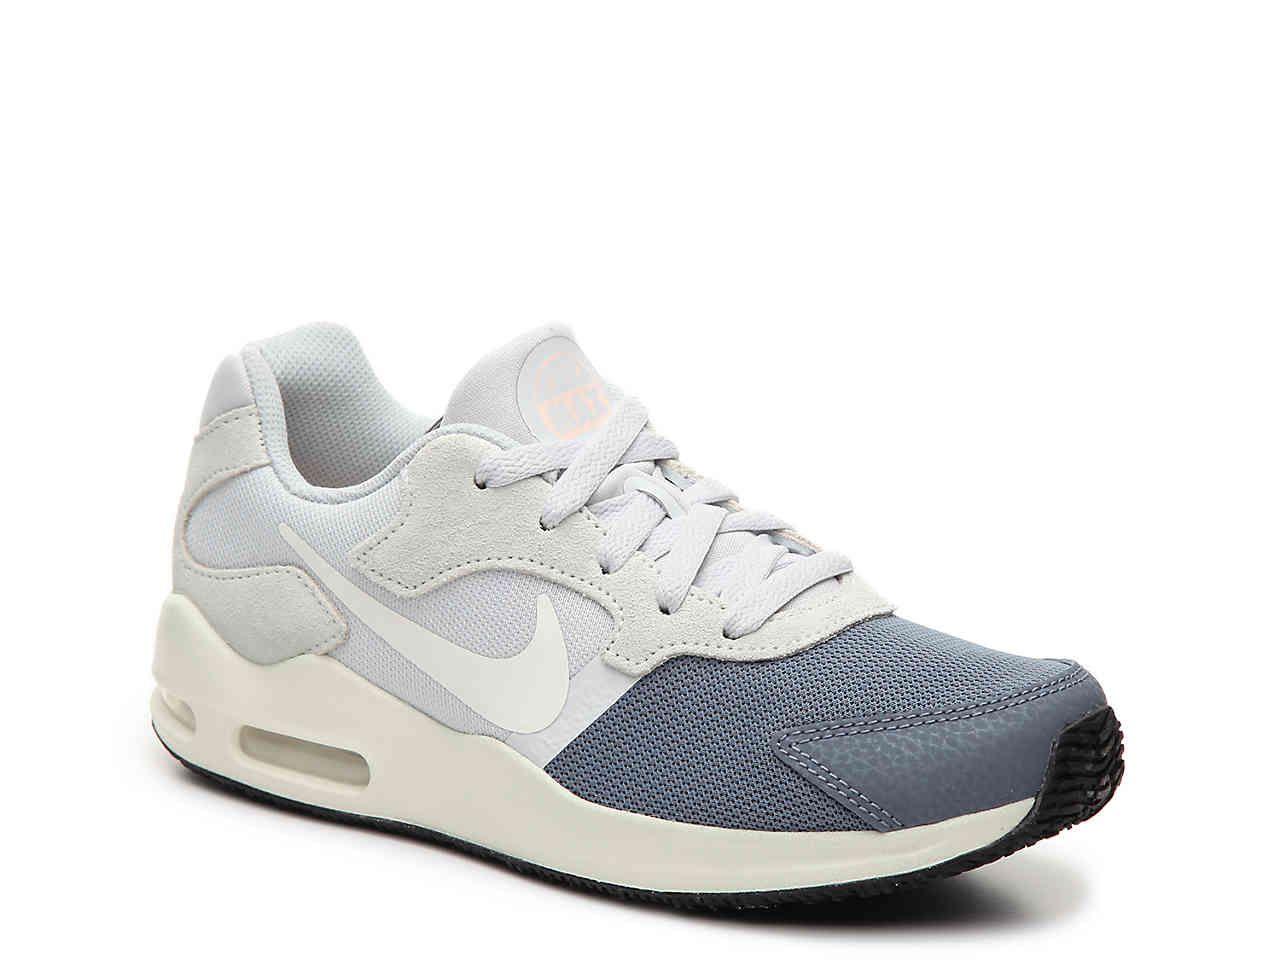 1d420d8d8c Air Max Guile Sneaker - Women's | new sneaks | Sneakers, Shoes, Boots